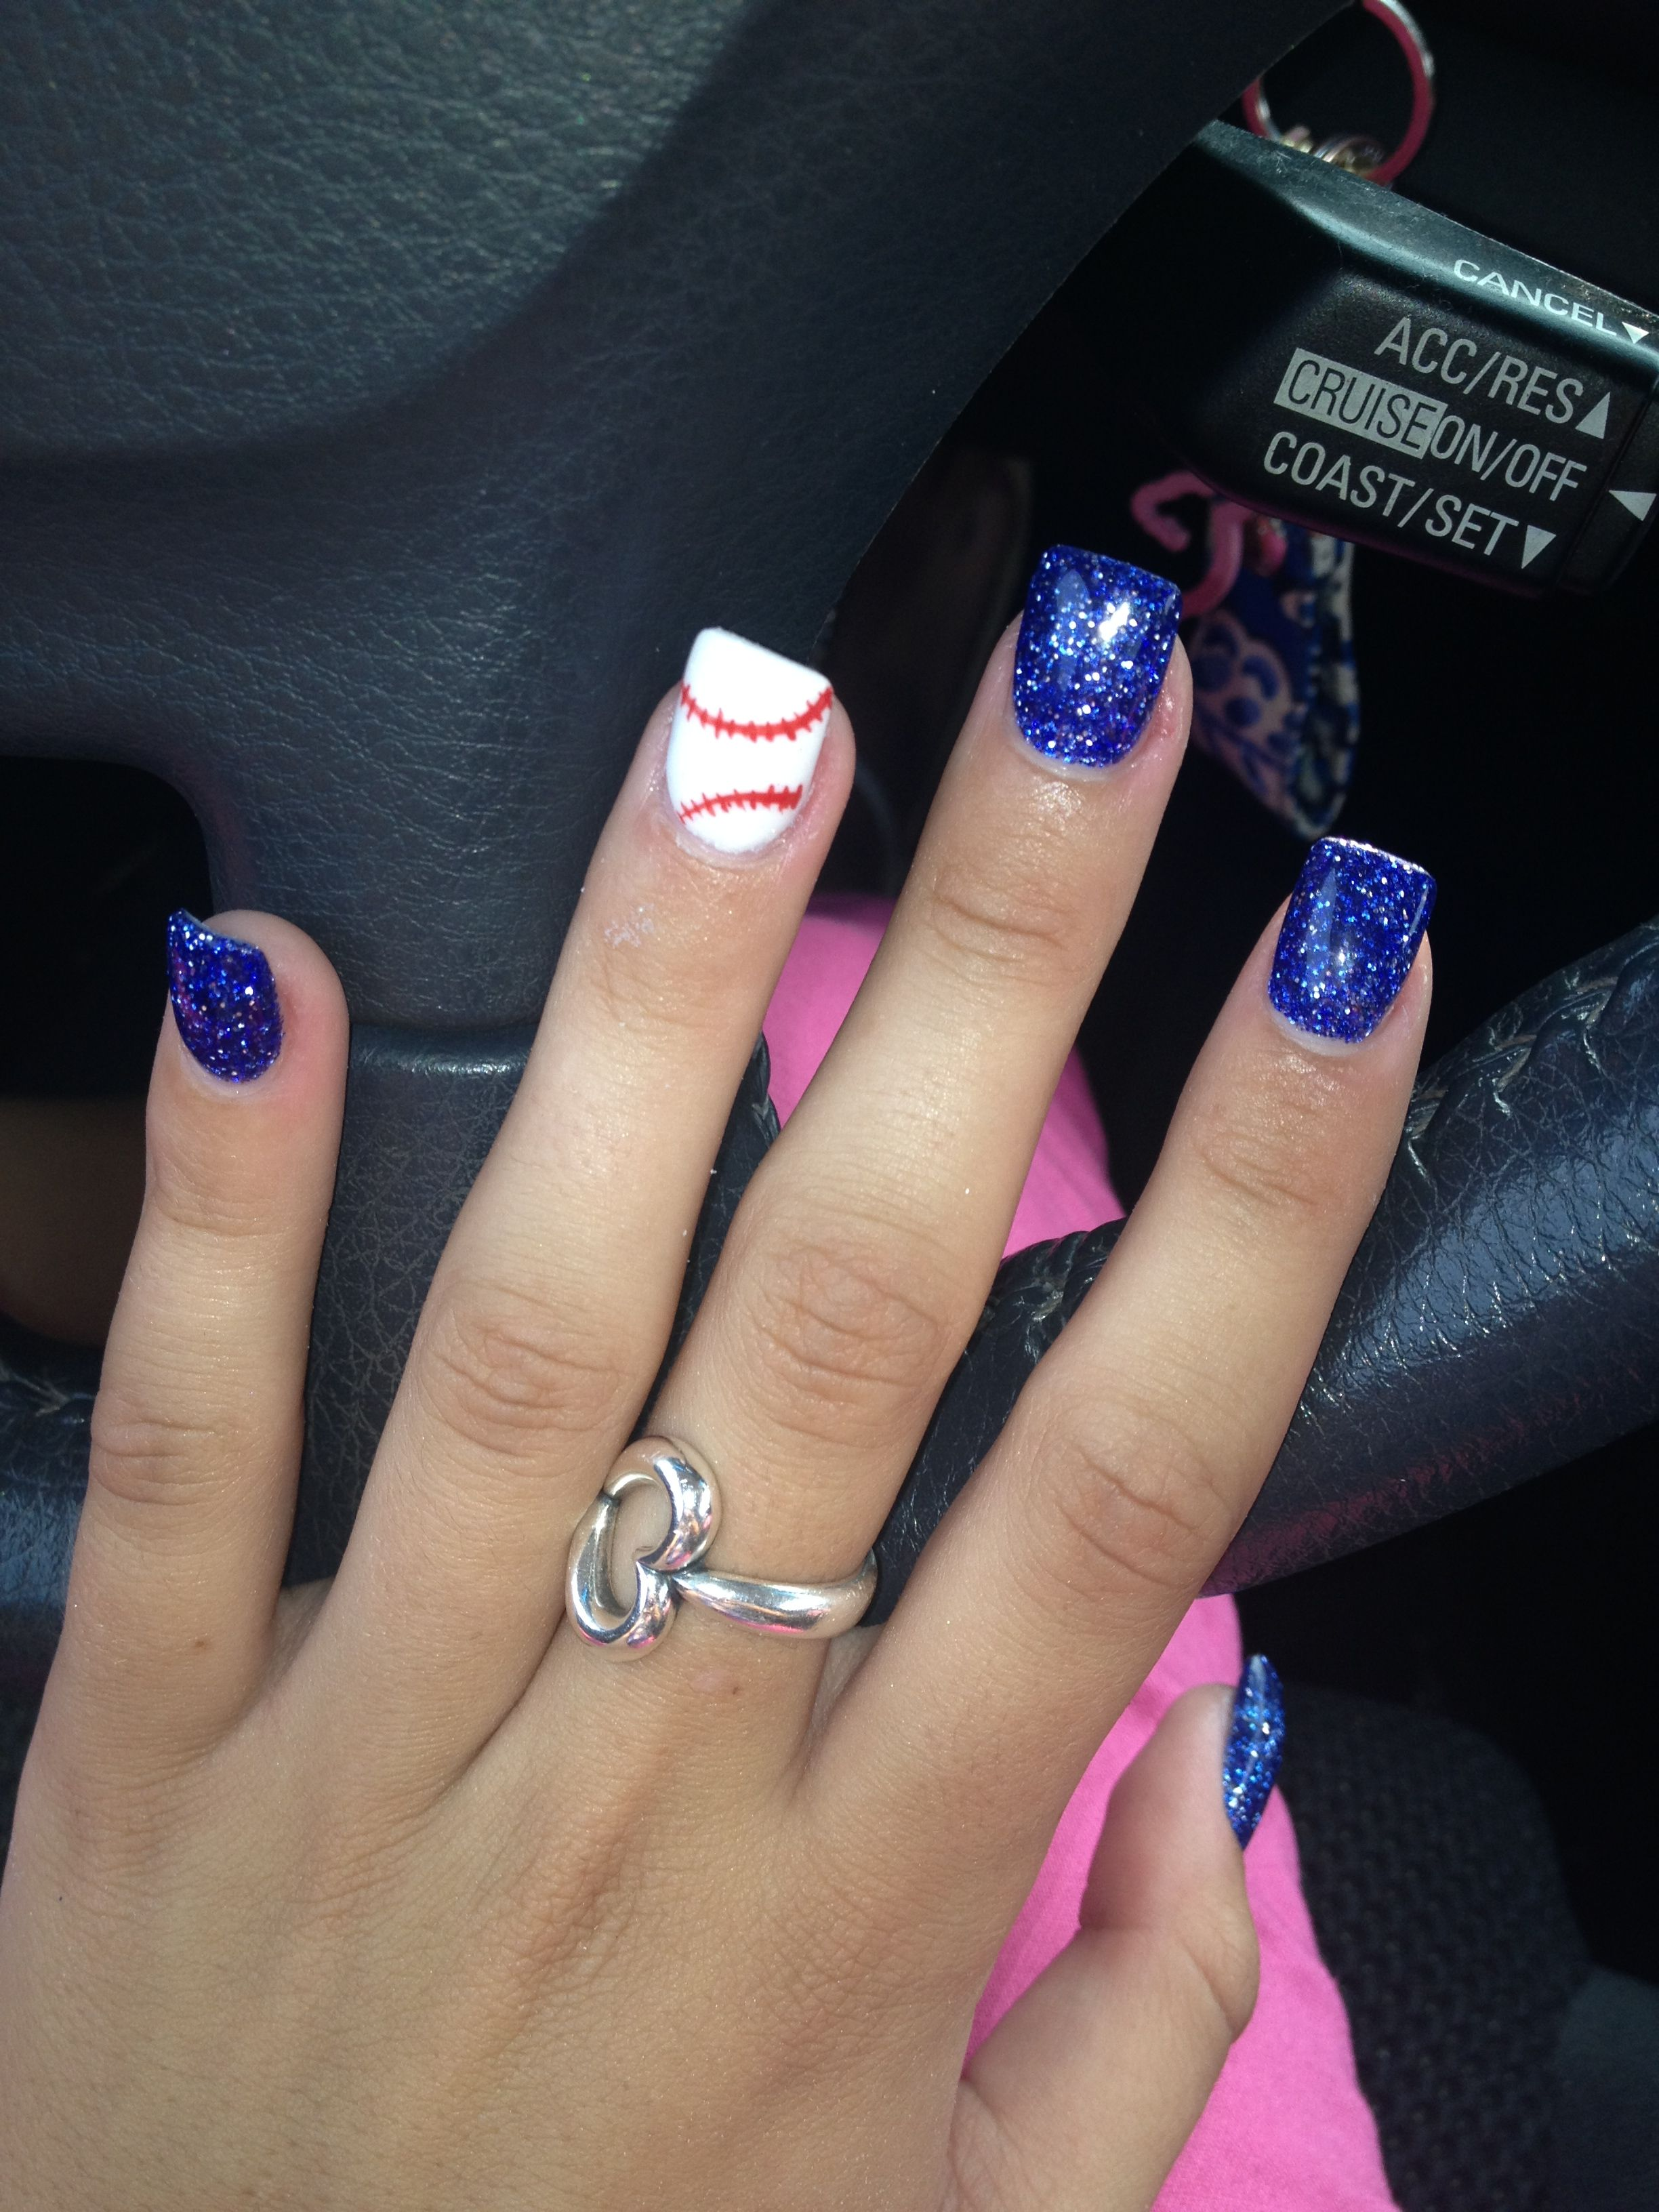 My baseball nails(: go rangers! | Nails | Pinterest